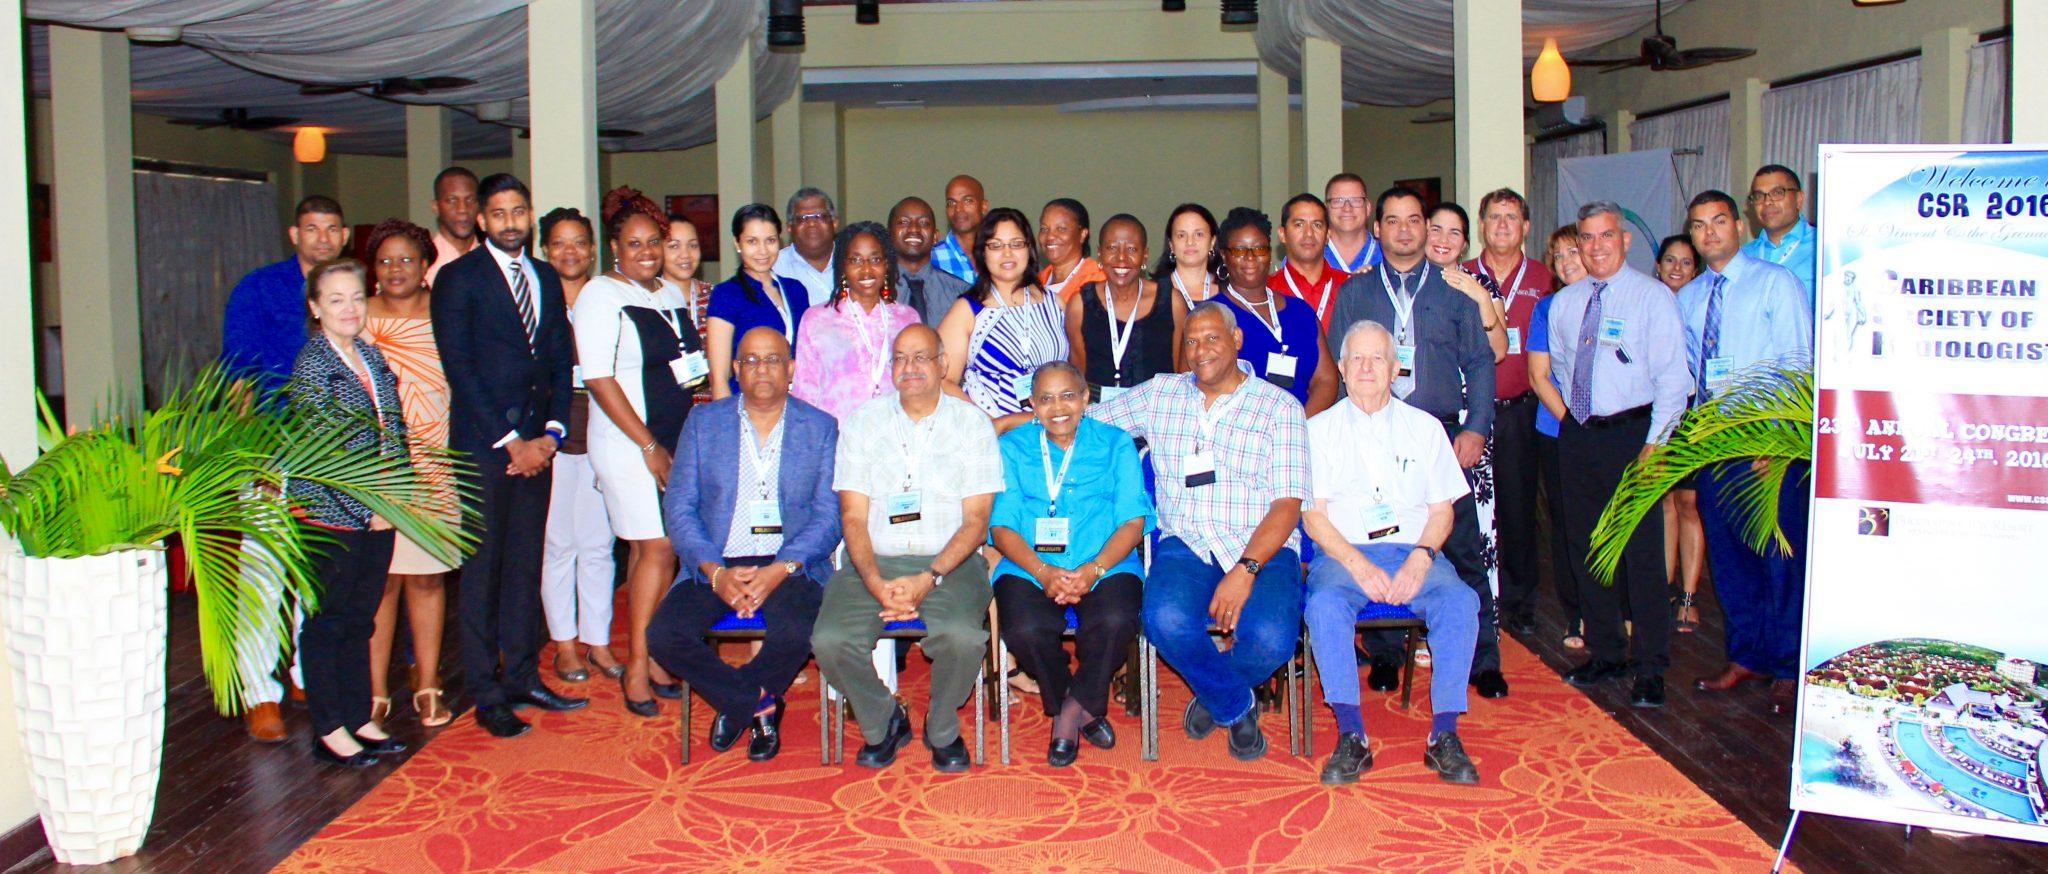 Front Row: From Left -- Dr. A. Ameeral (Trinidad) Dr. P. Maharaj (Trinidad) Dr. R.e. Ambrose (Svg), Dr. J. Jessurun (Suriname/Curaçao,) Dr. N. Moule (Jamaica).